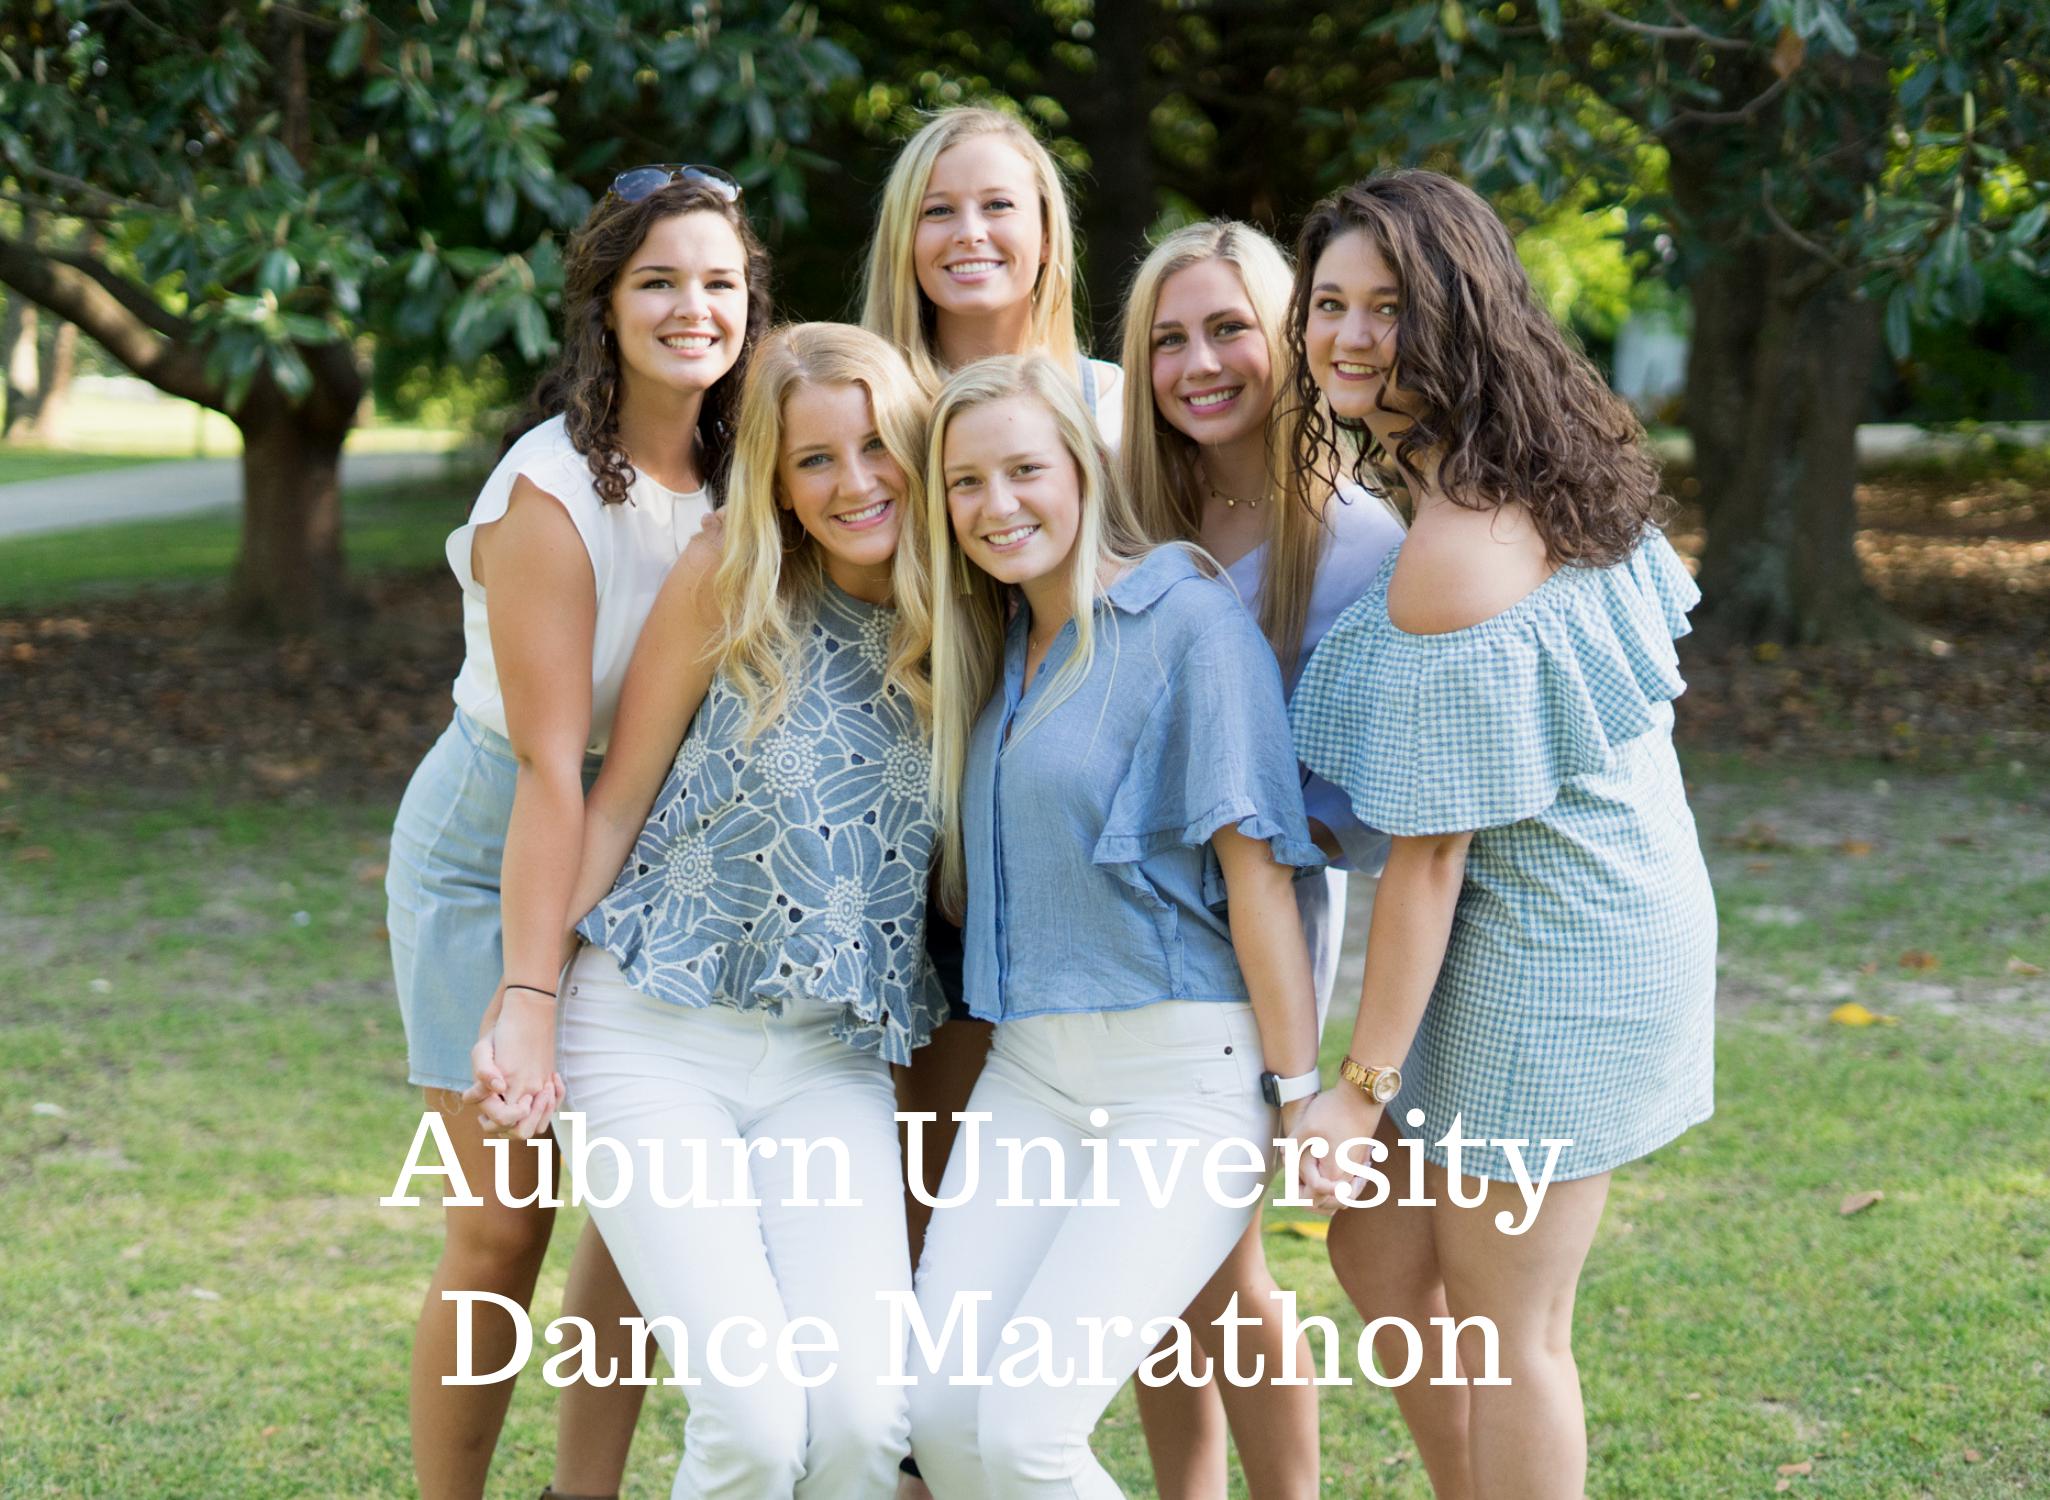 Auburn University Dance Marathon.png